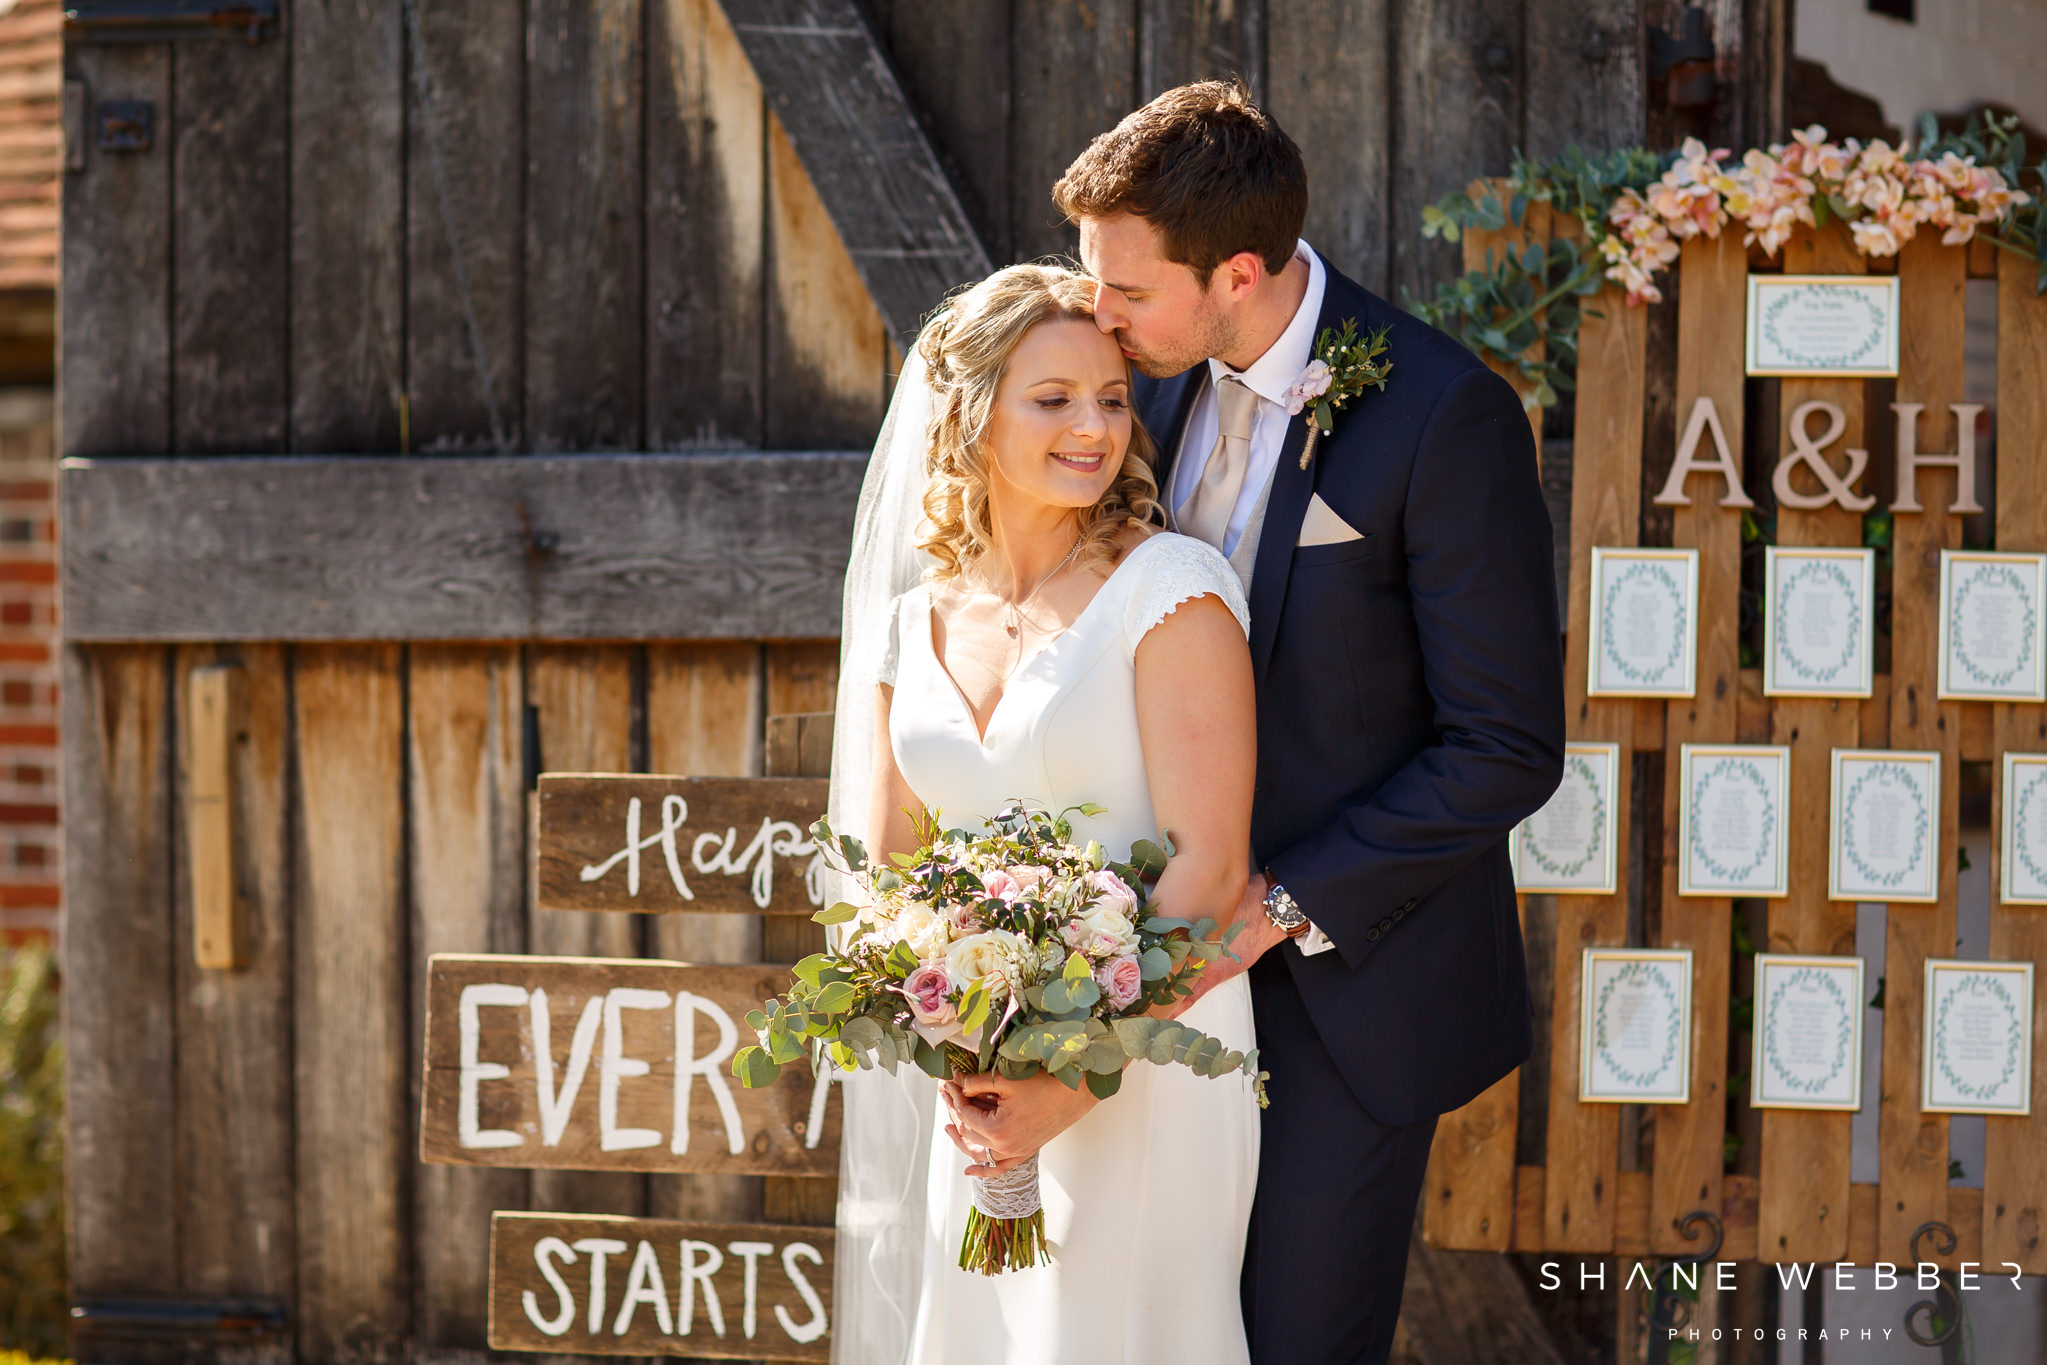 Ufton-Court-Spring-Wedding-Photography-10369.jpg